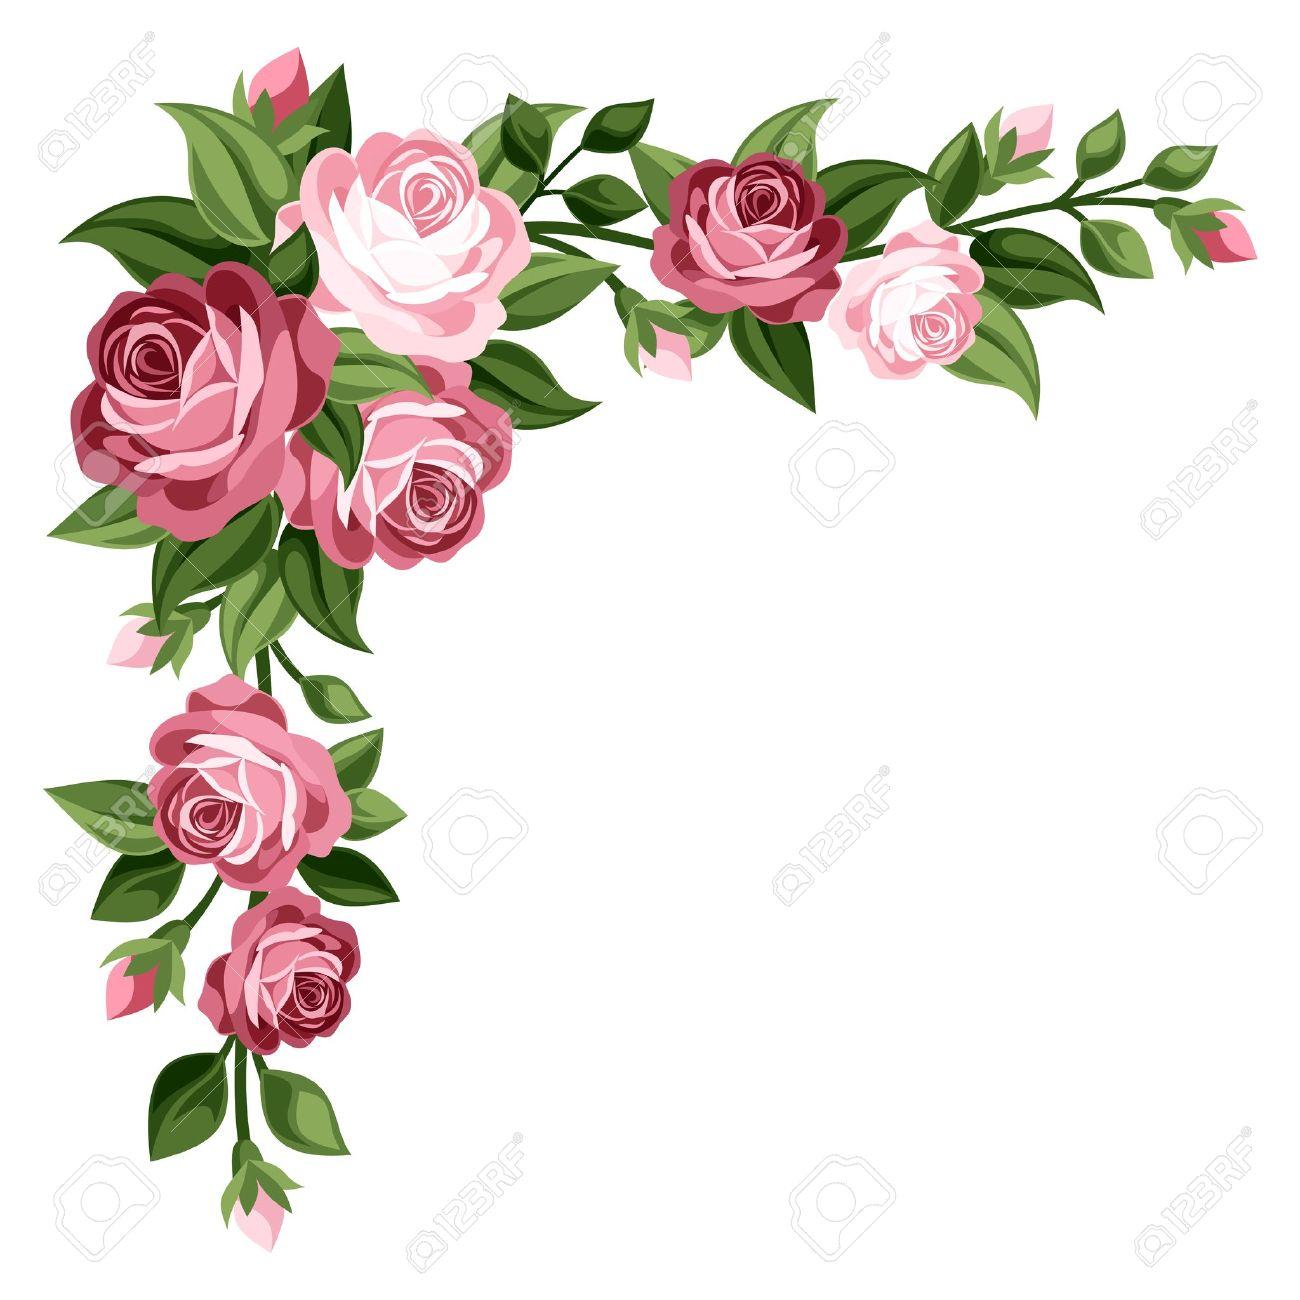 1300x1300 Pink Vintage Roses, Rosebuds And Leaves Illustration Royalty Free